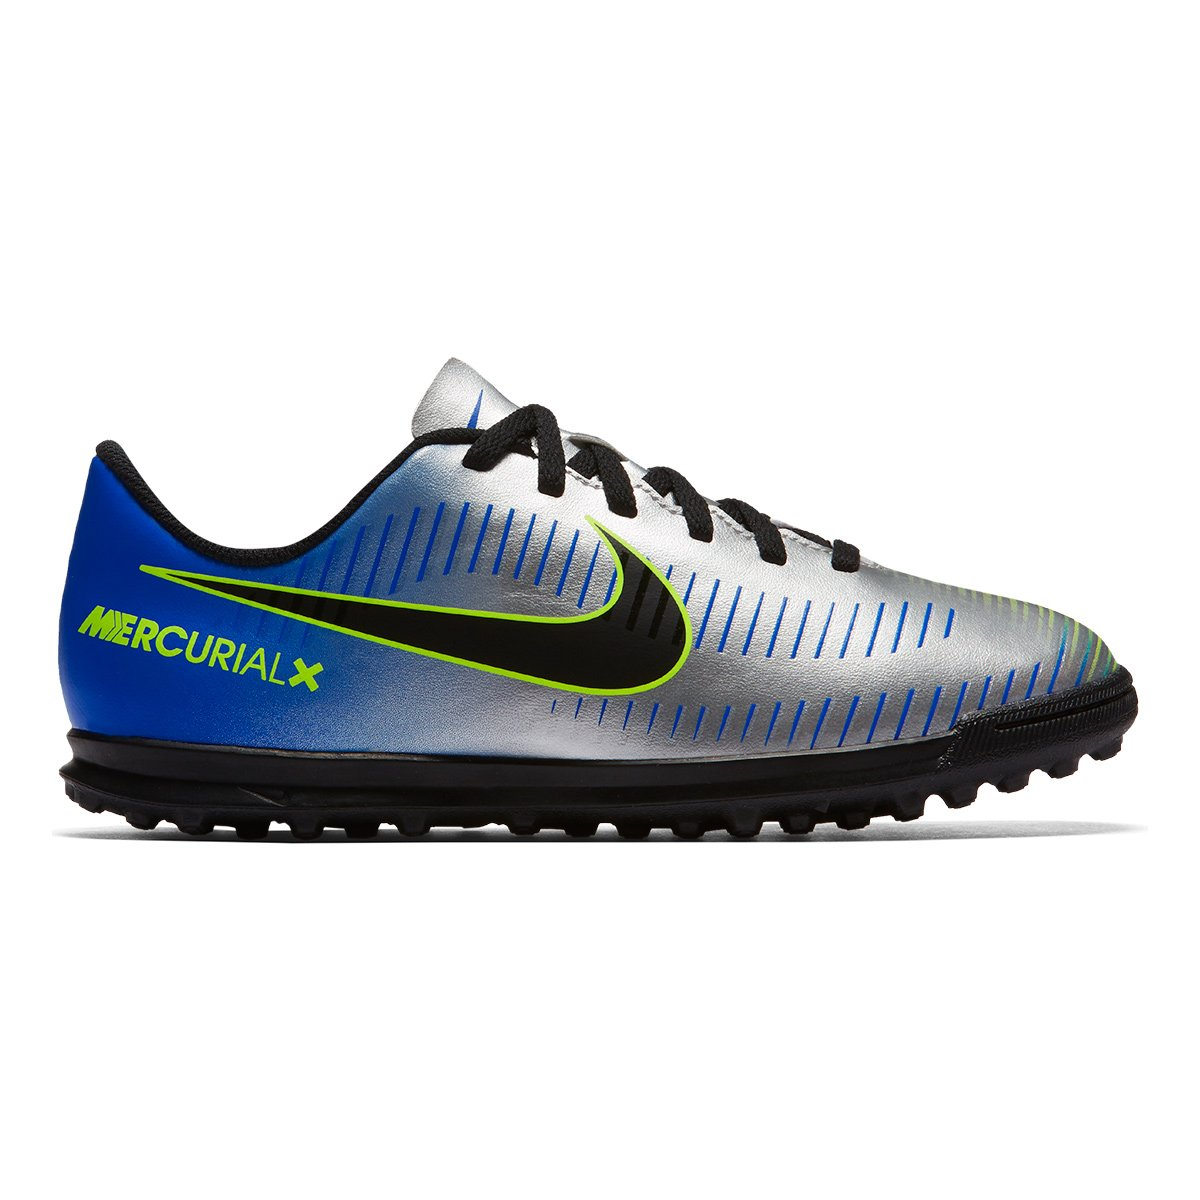 7c571cff4a Chuteira Society Infantil Nike Mercurial Vortex 3 Neymar Jr TF ...